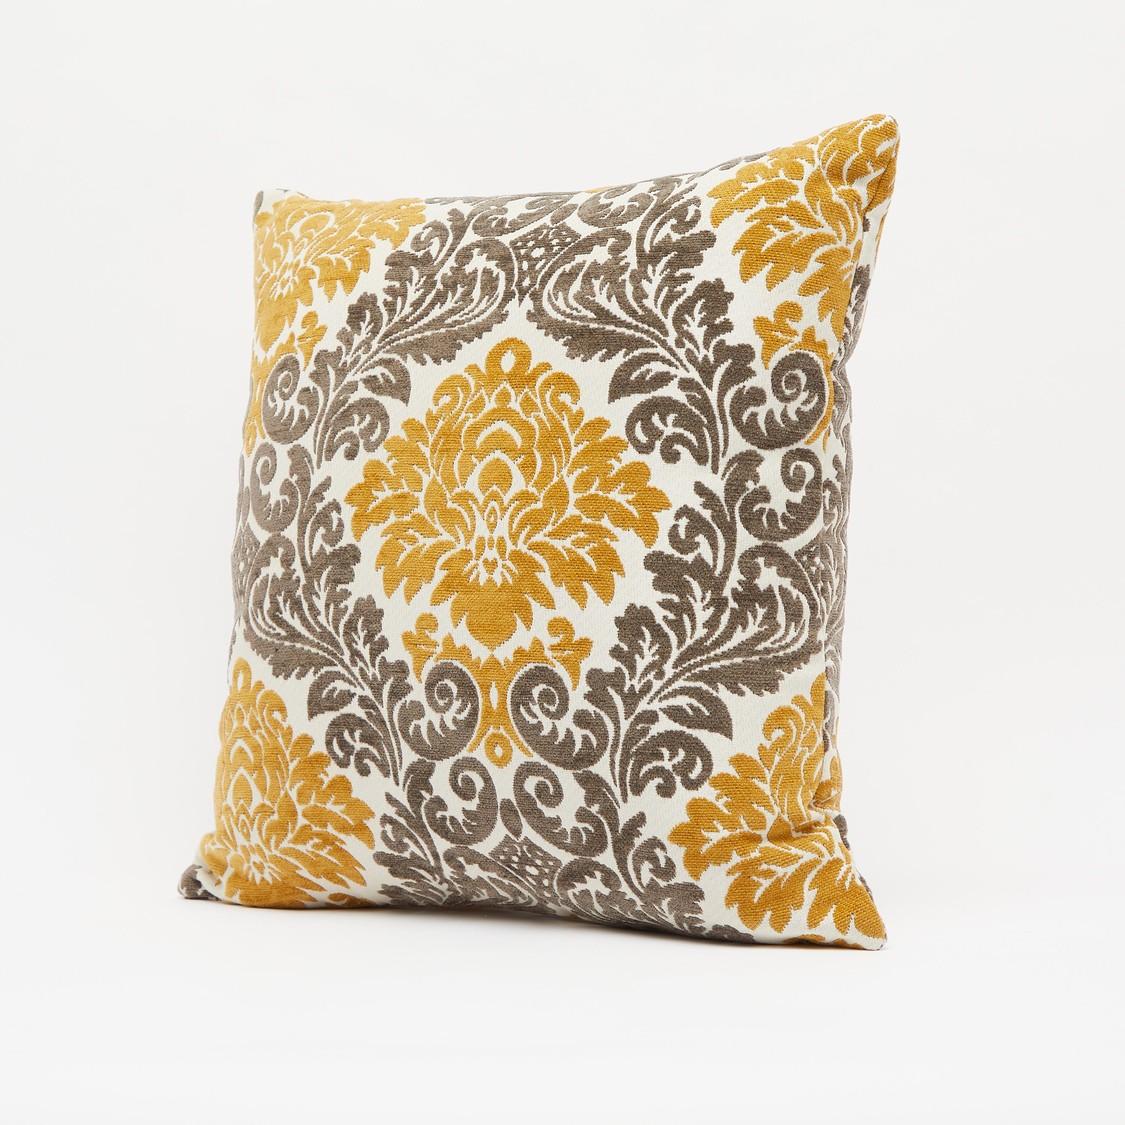 Jacquard Filled Cushion - 43x43 cms